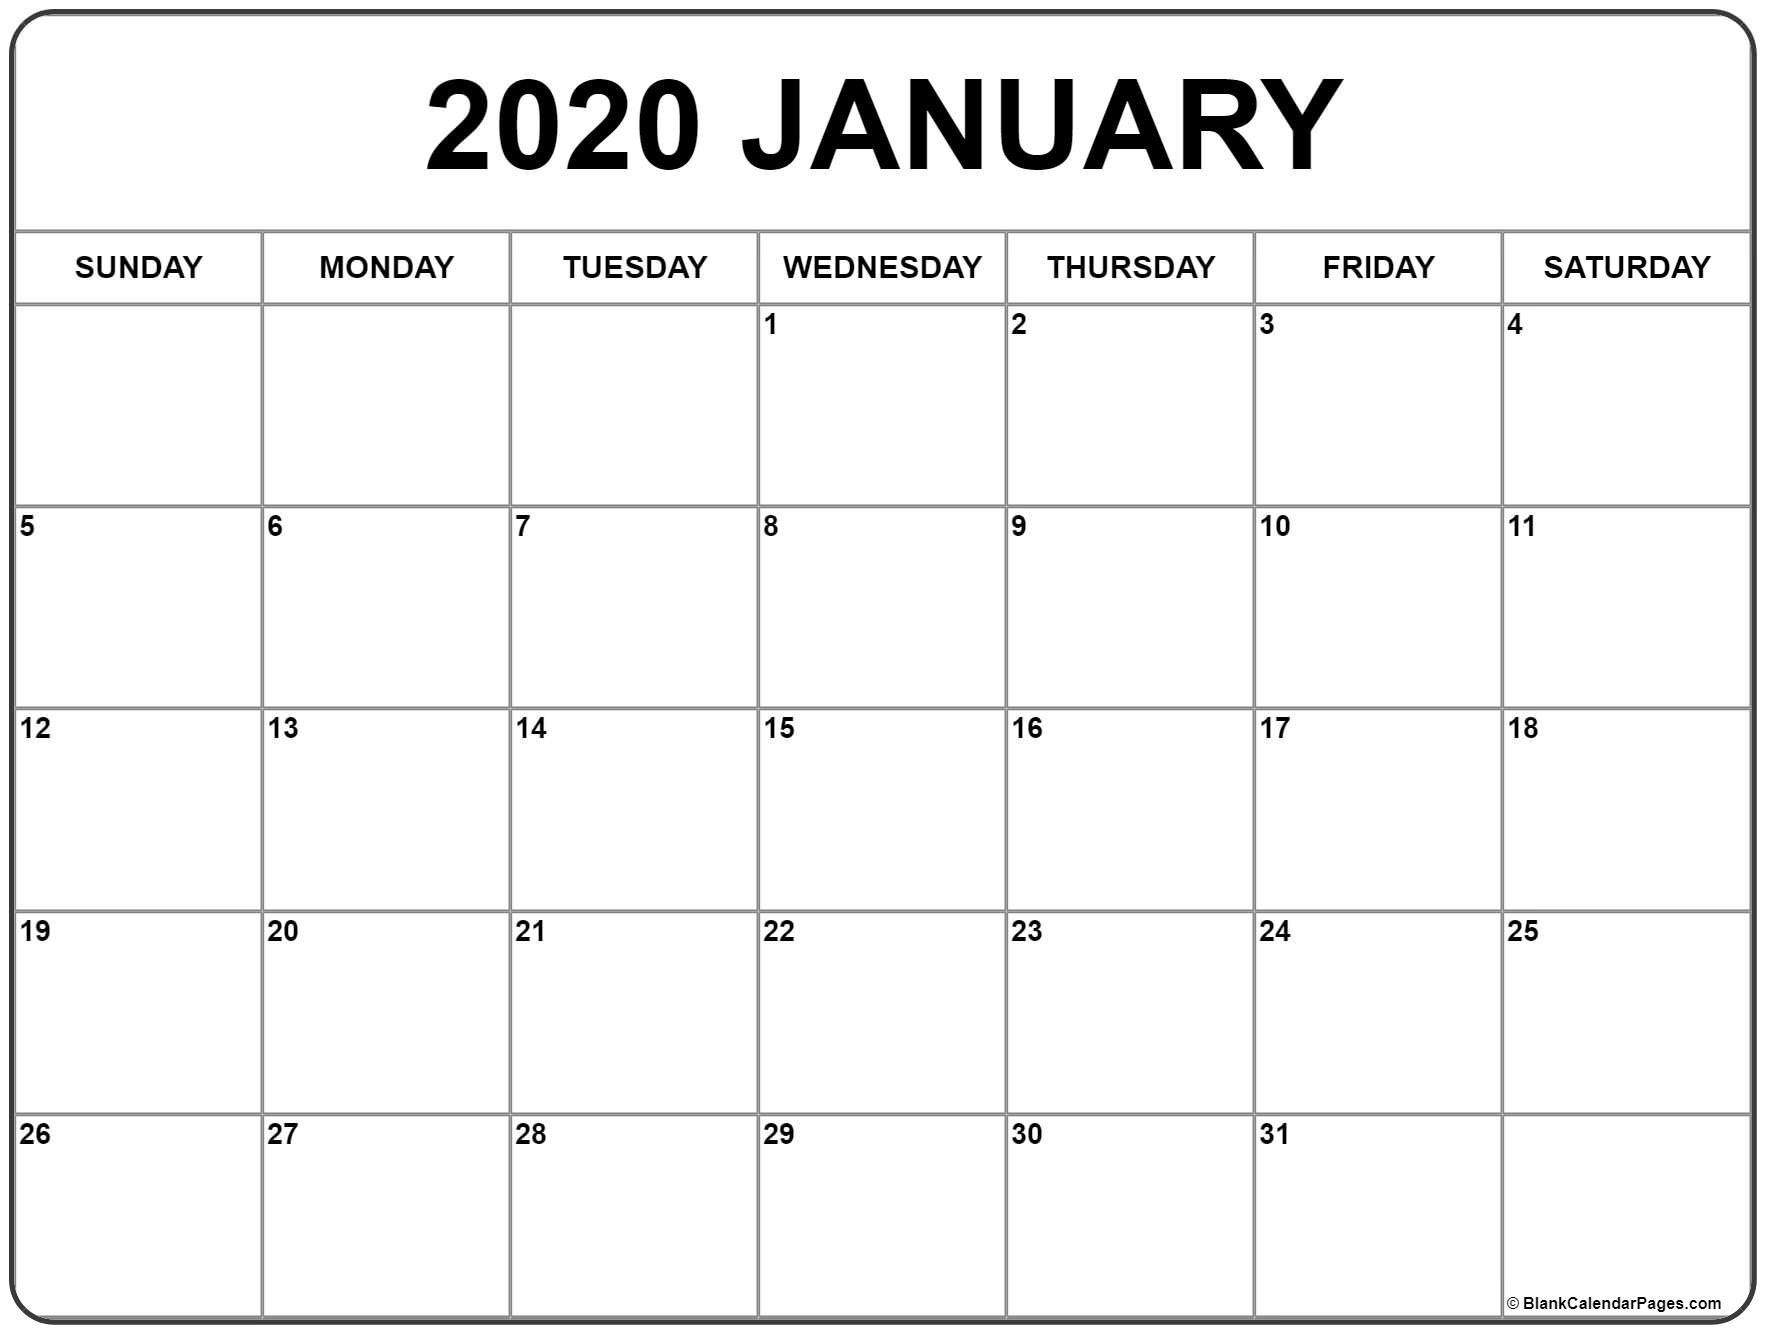 January 2020 Calendar | Free Printable Monthly Calendars  2020 Printable Calendar By Month